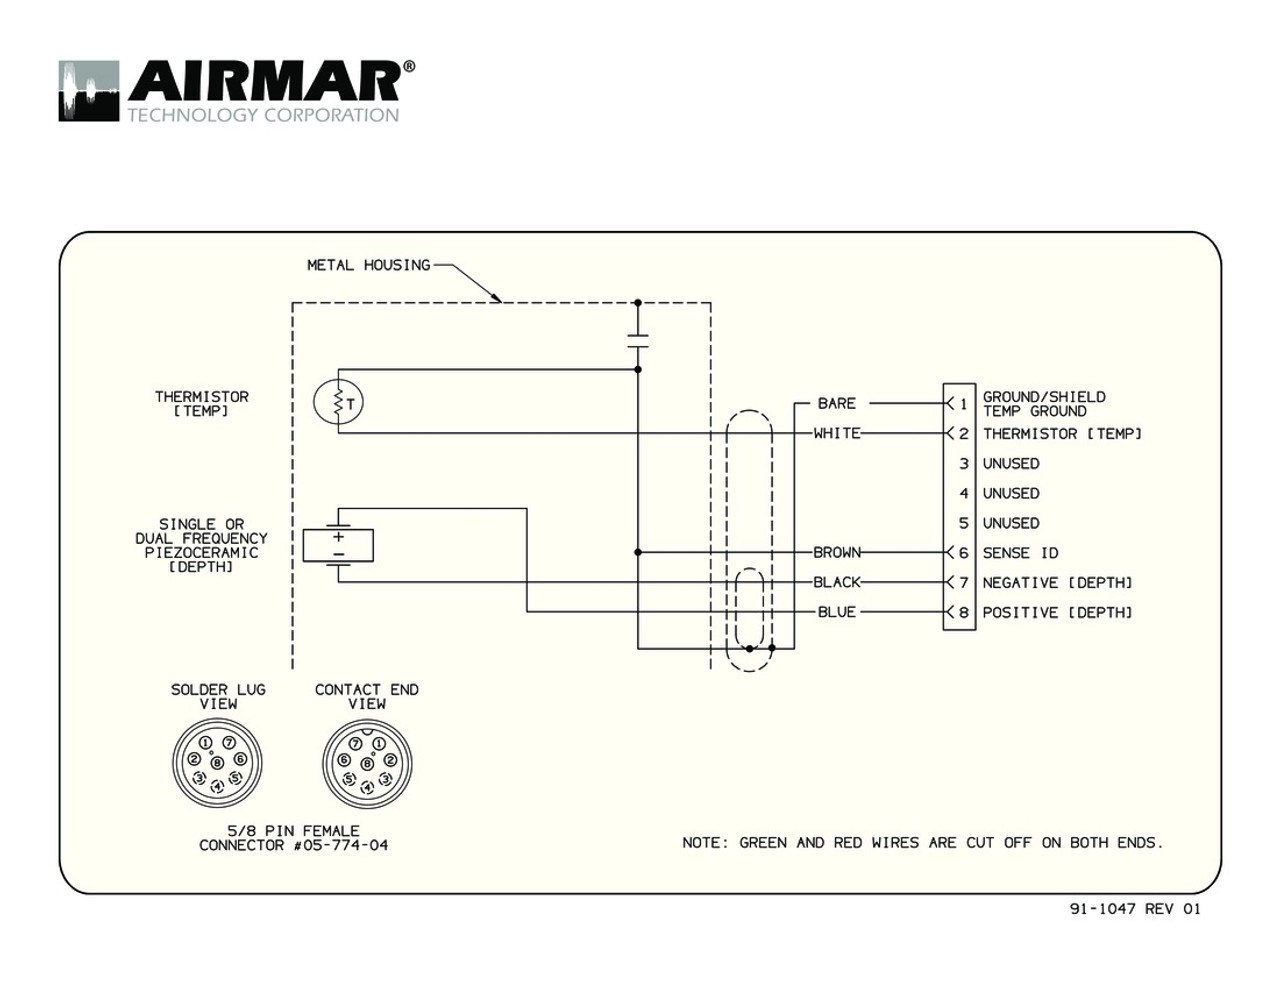 airmar wiring diagram garmin b117 8 pin d t blue bottle marine wiring diagram for garmin fishfinder 90 wiring diagram garmin [ 1280 x 989 Pixel ]